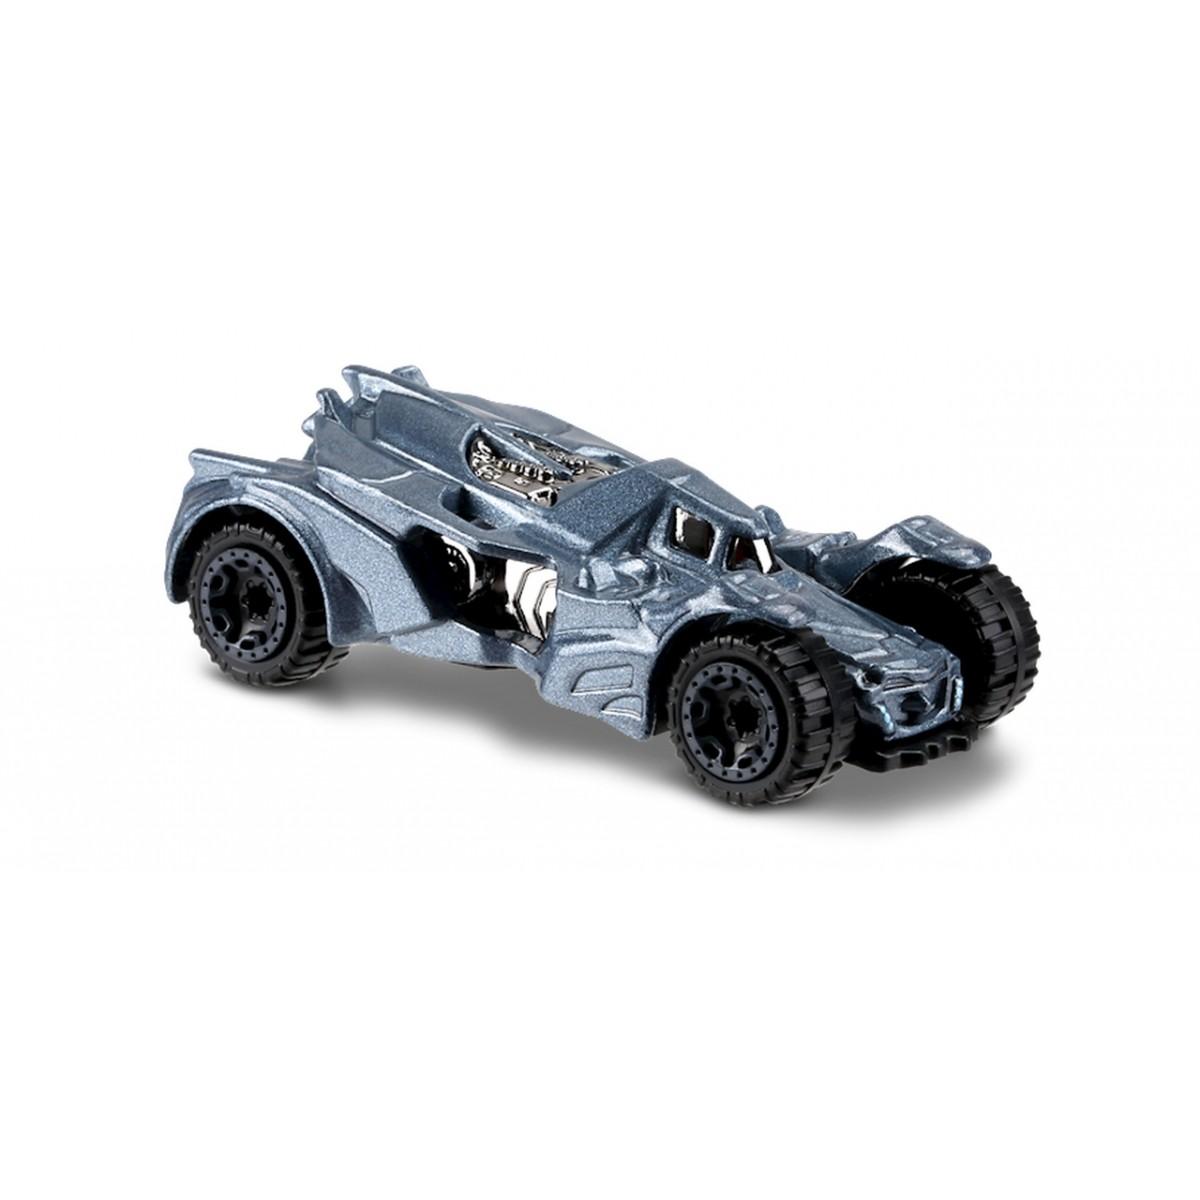 Carrinho Hot Wheels: Batman: Arkham Knight Batmobile Prateado